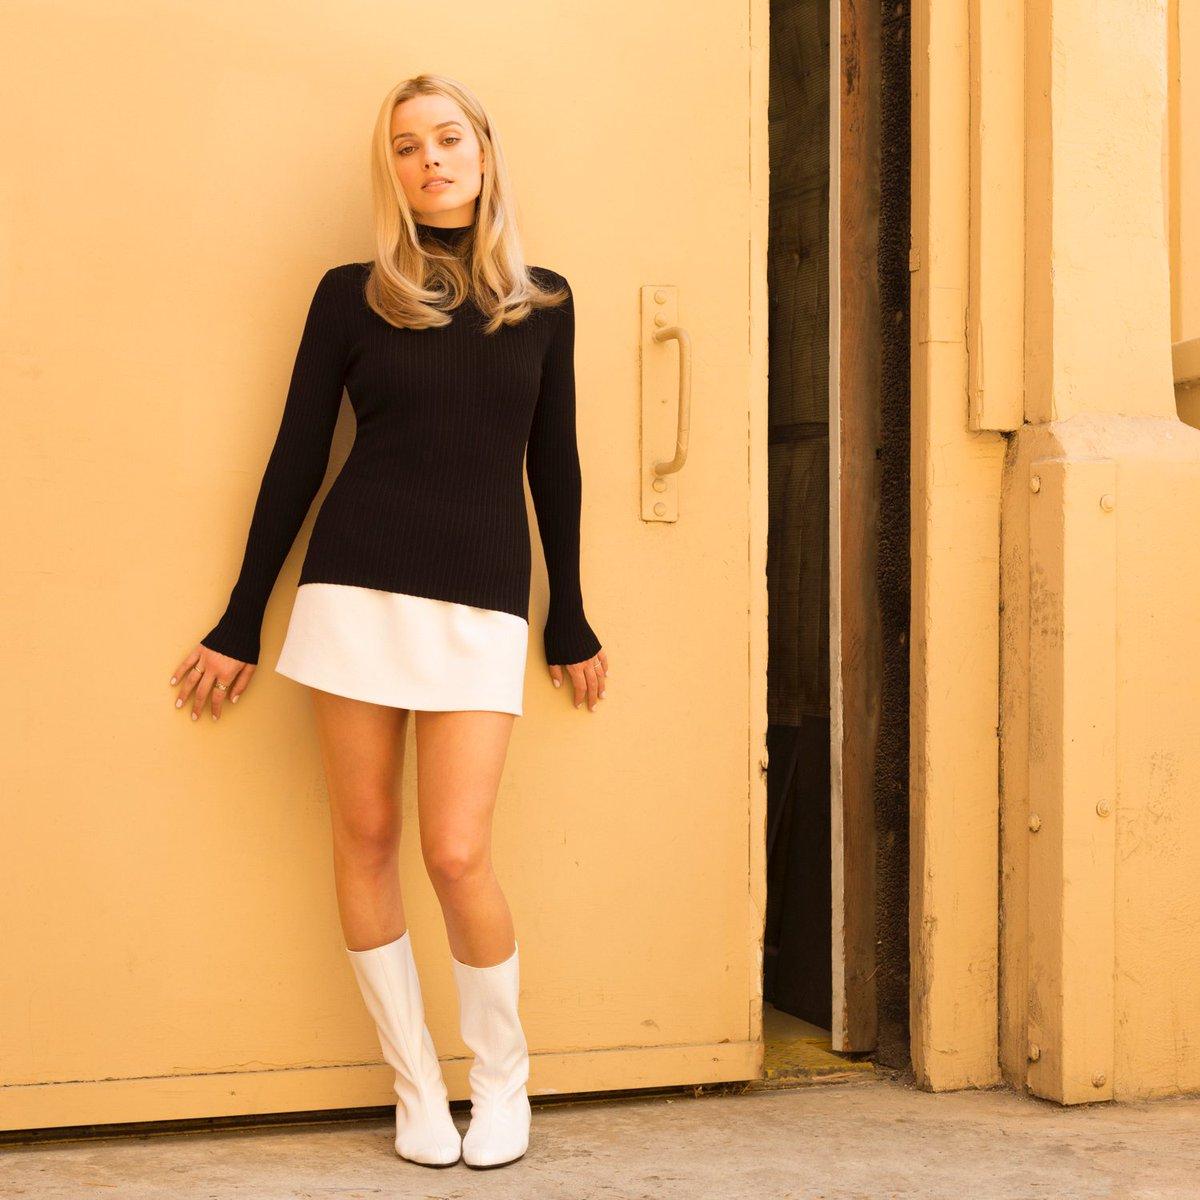 Lena Dunham rejoint le casting XXL du prochain film de Tarantino